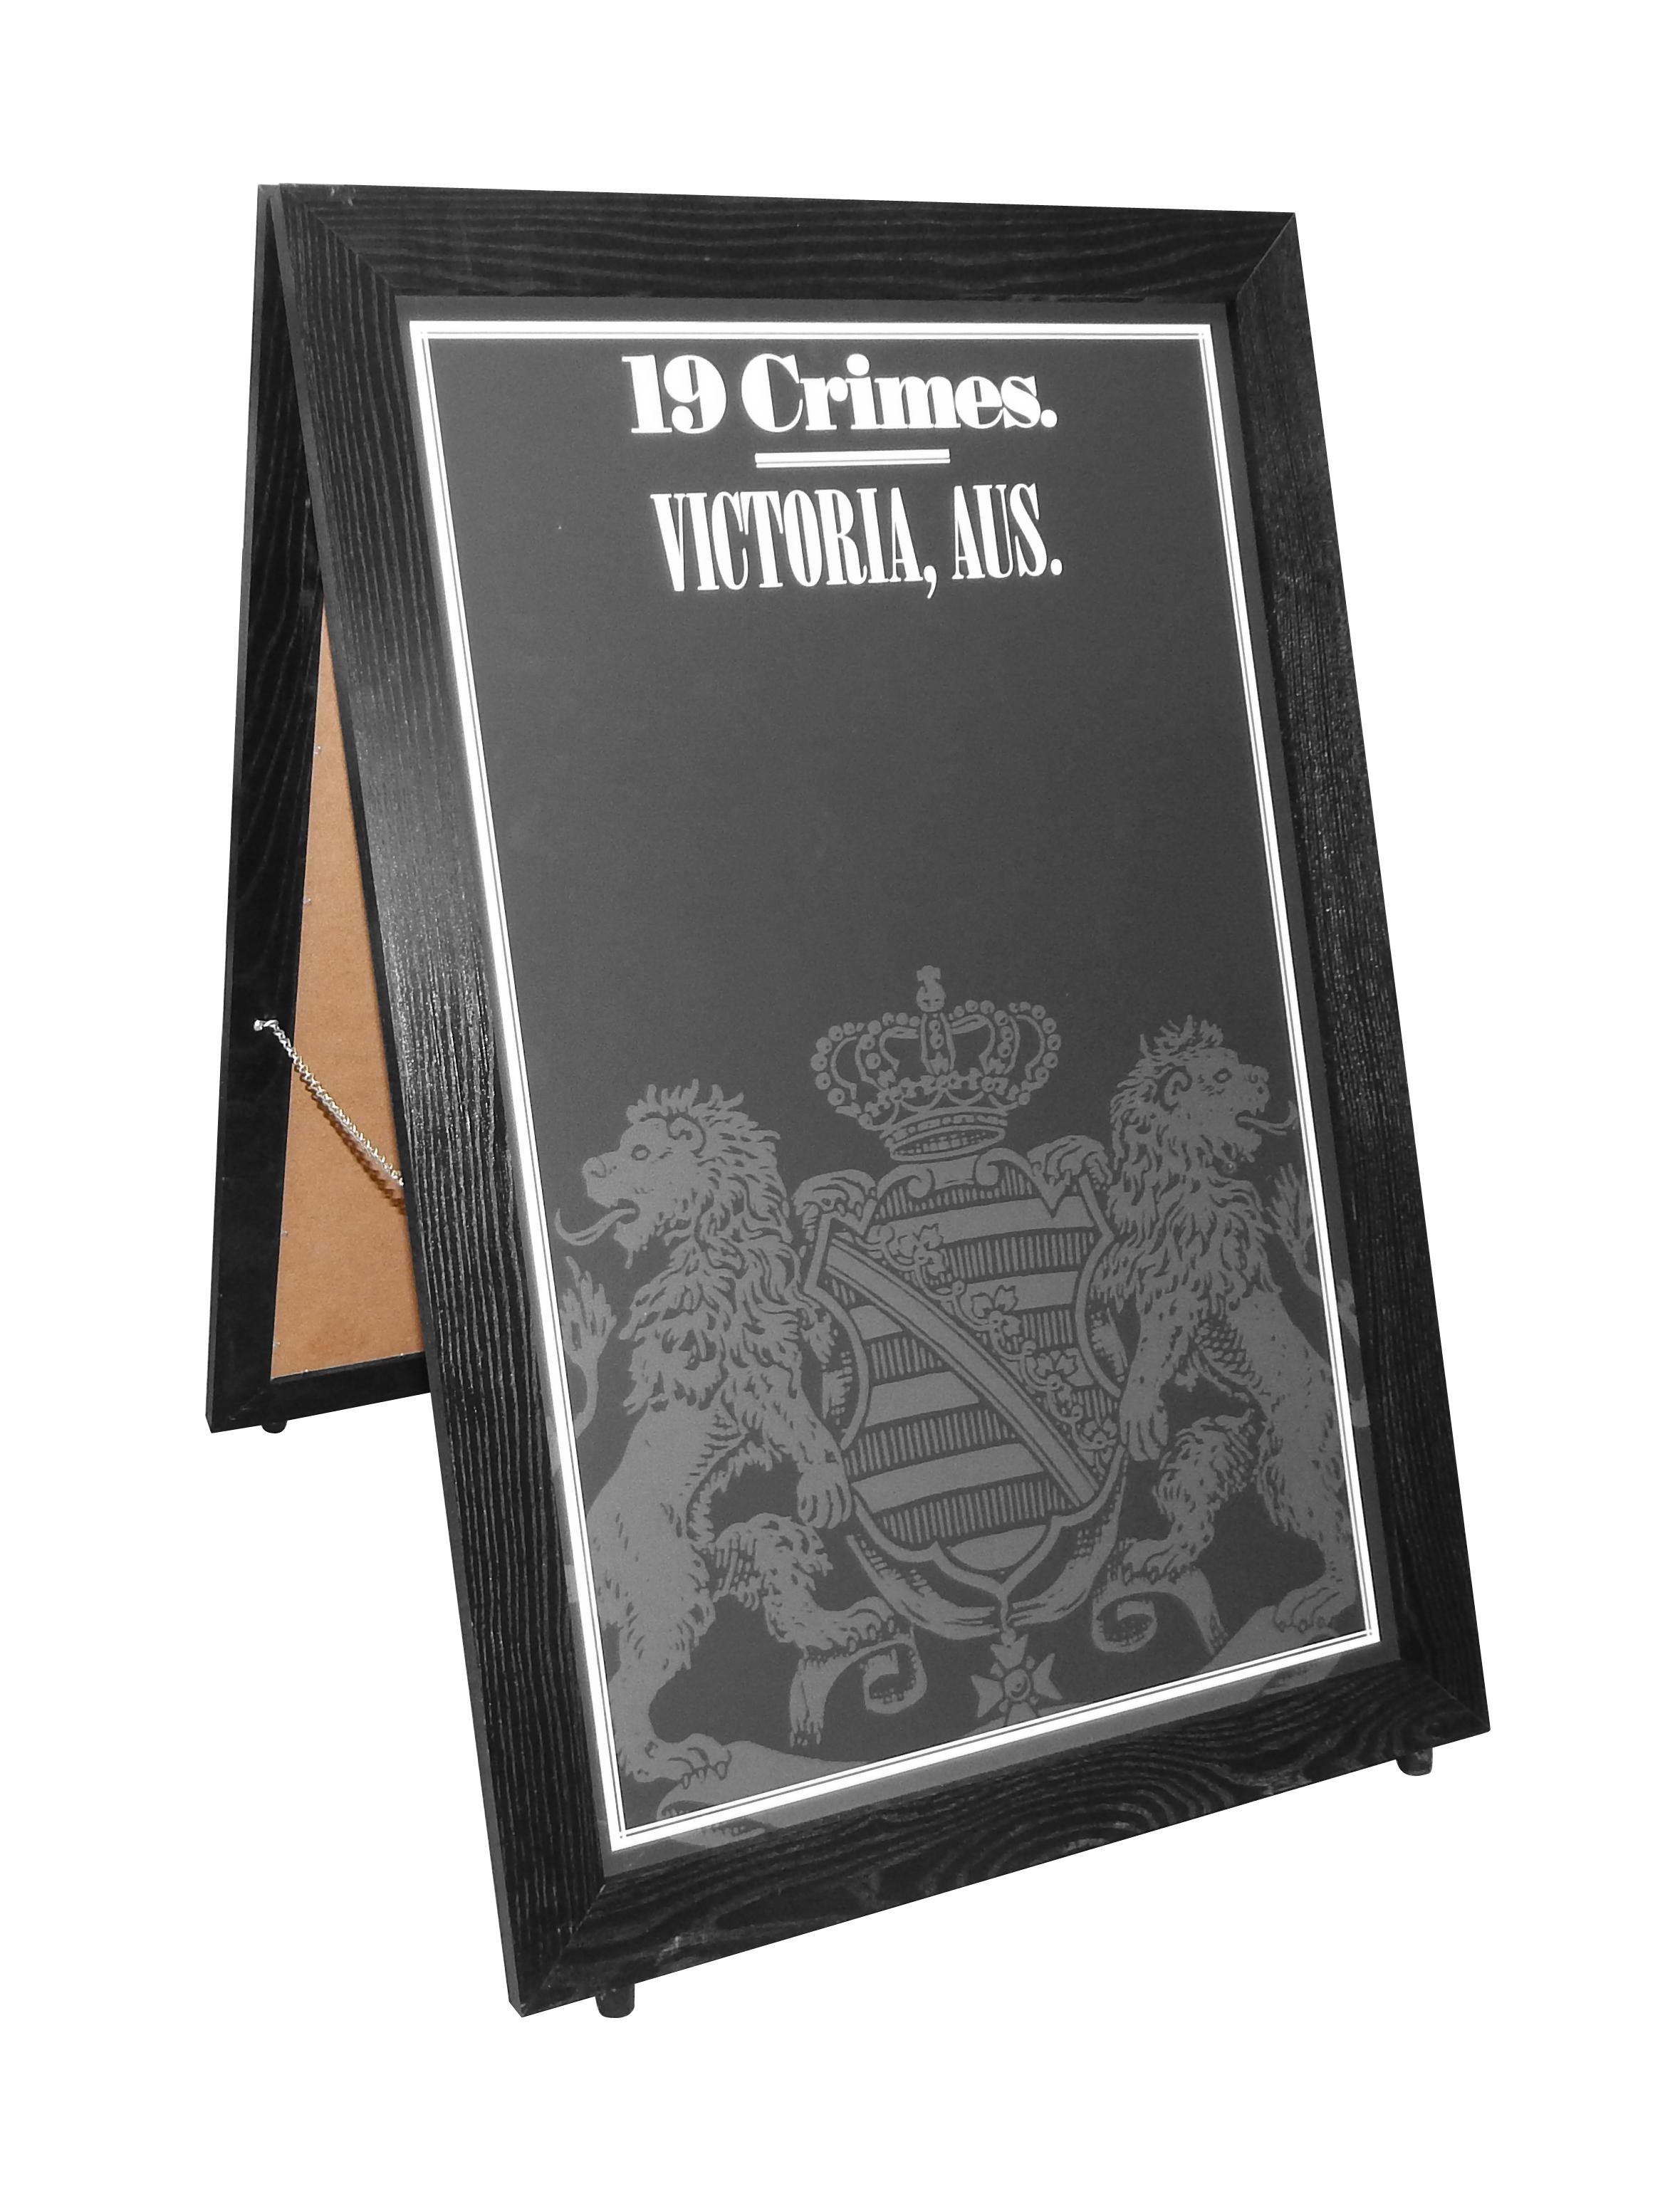 2016-9-1 InnerWorkings - 19 Crimes A-Fra